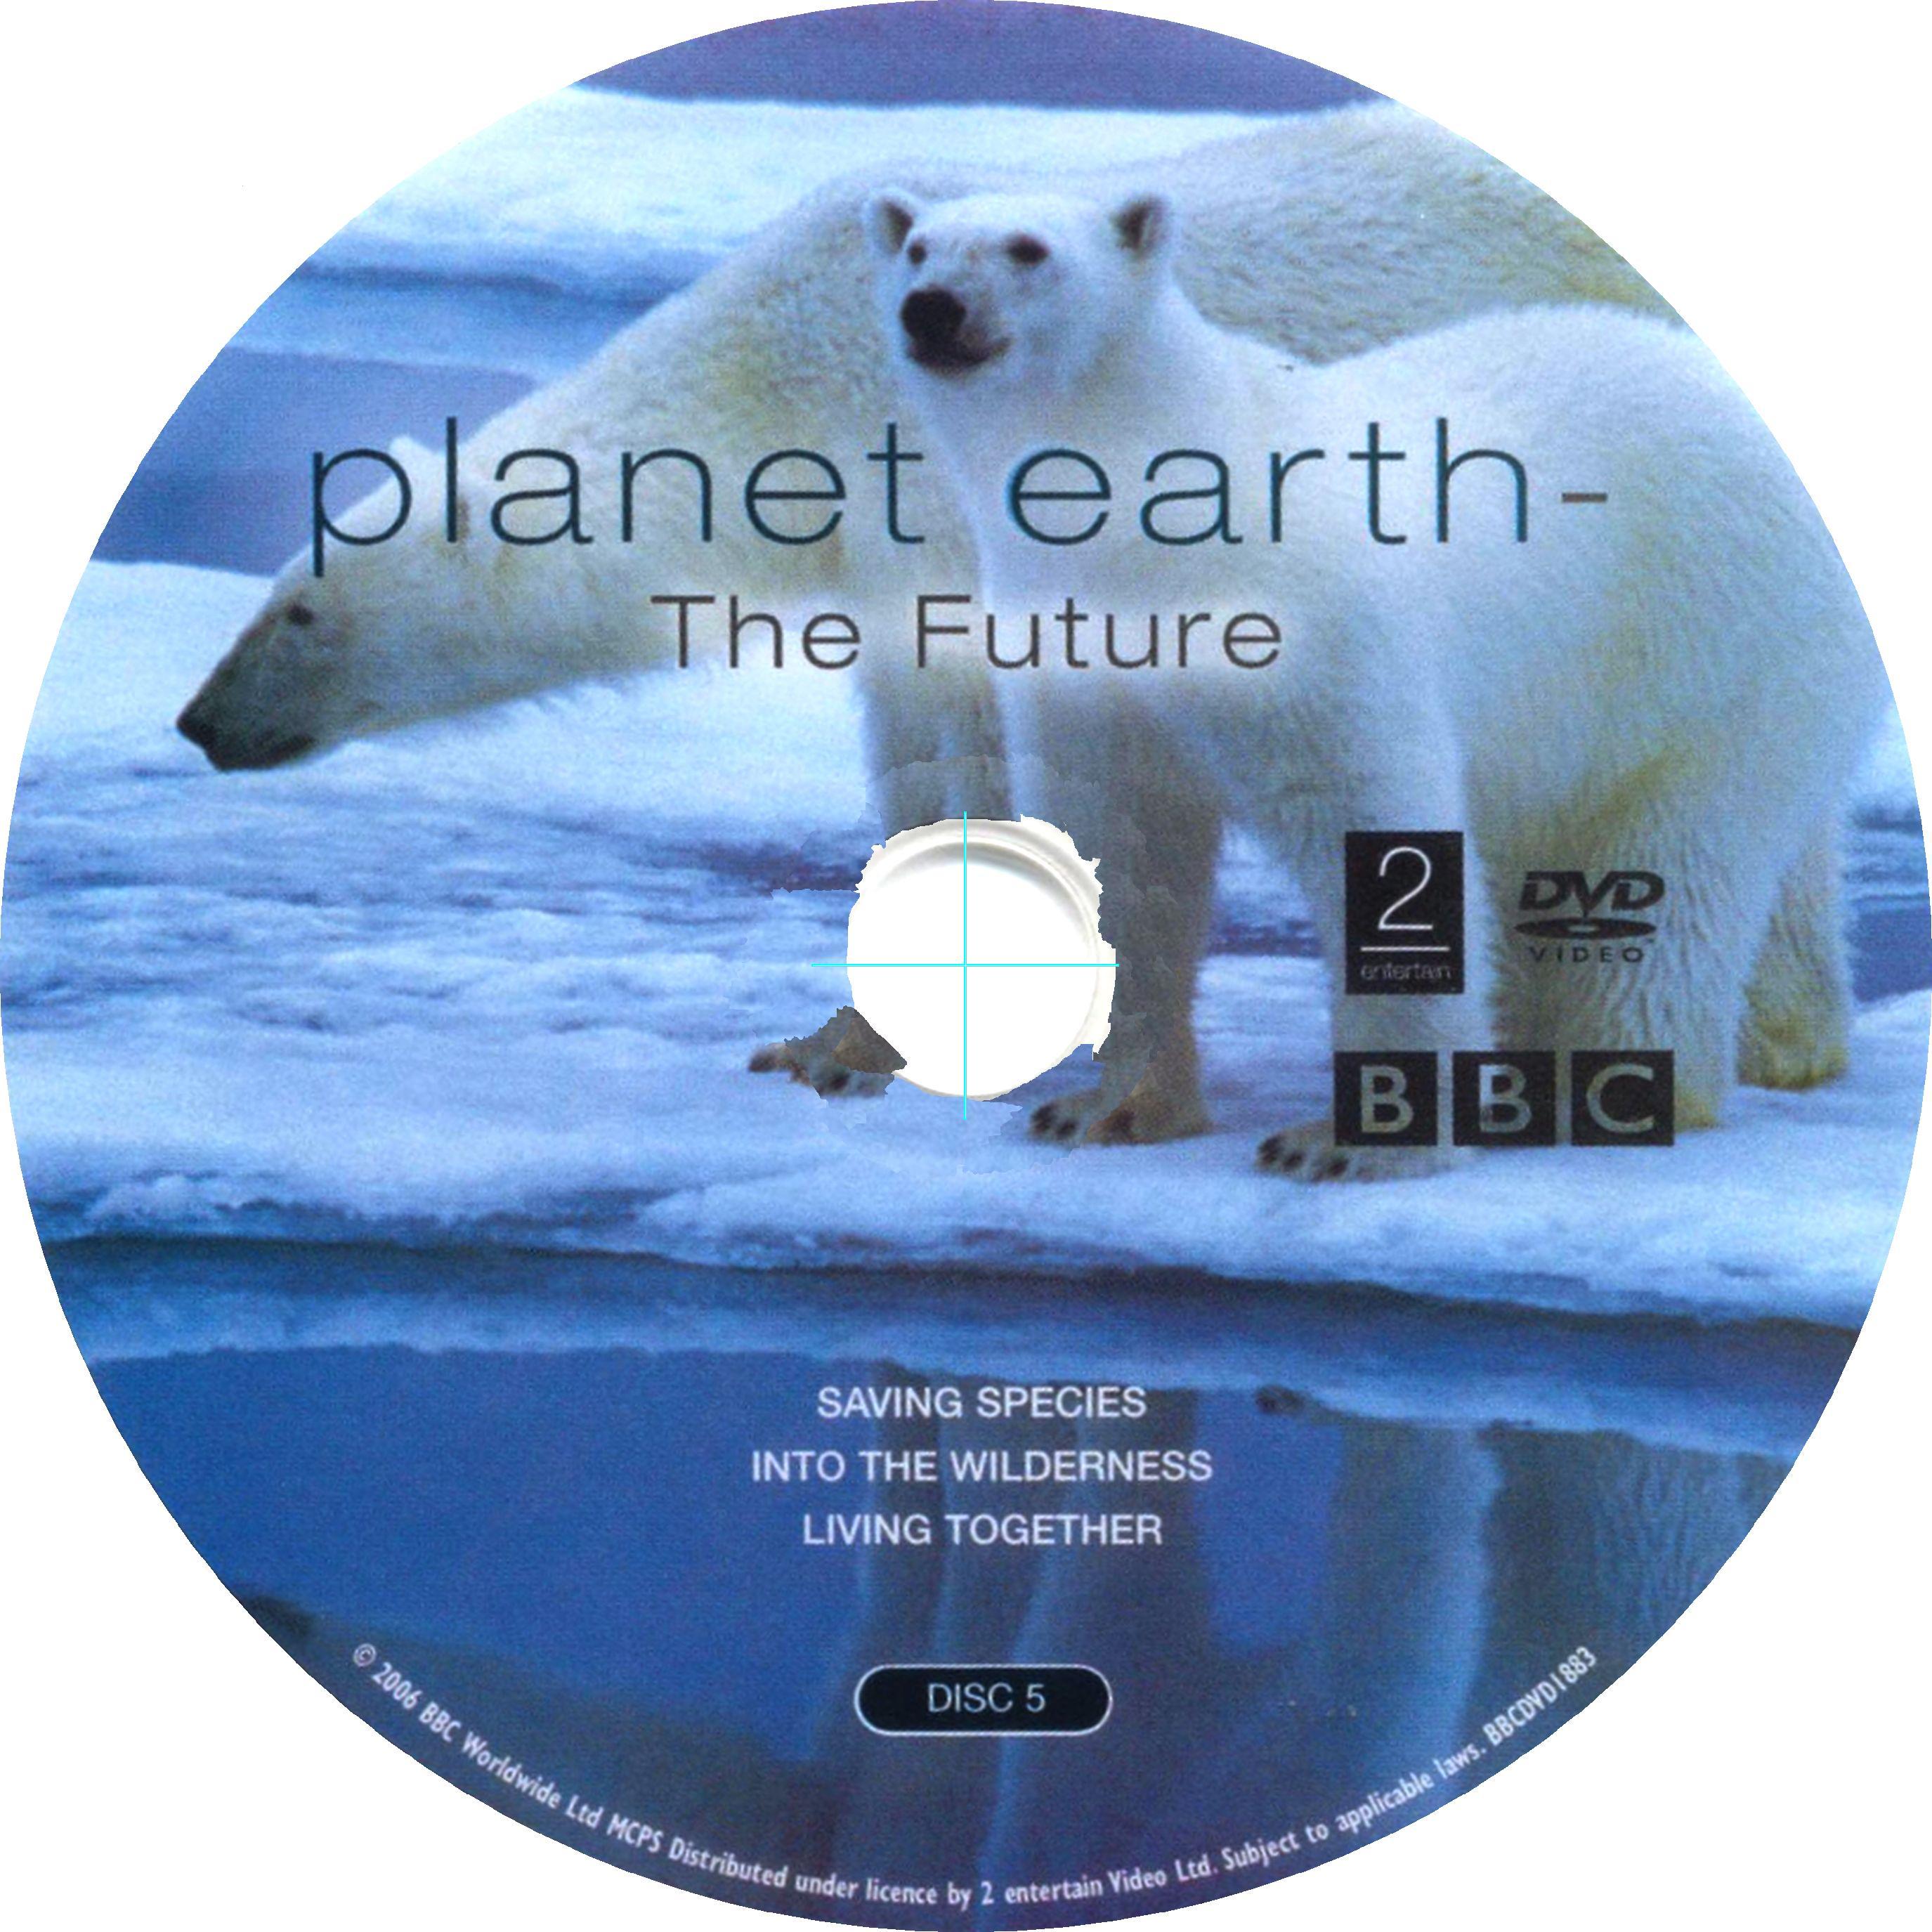 planet earth dvd